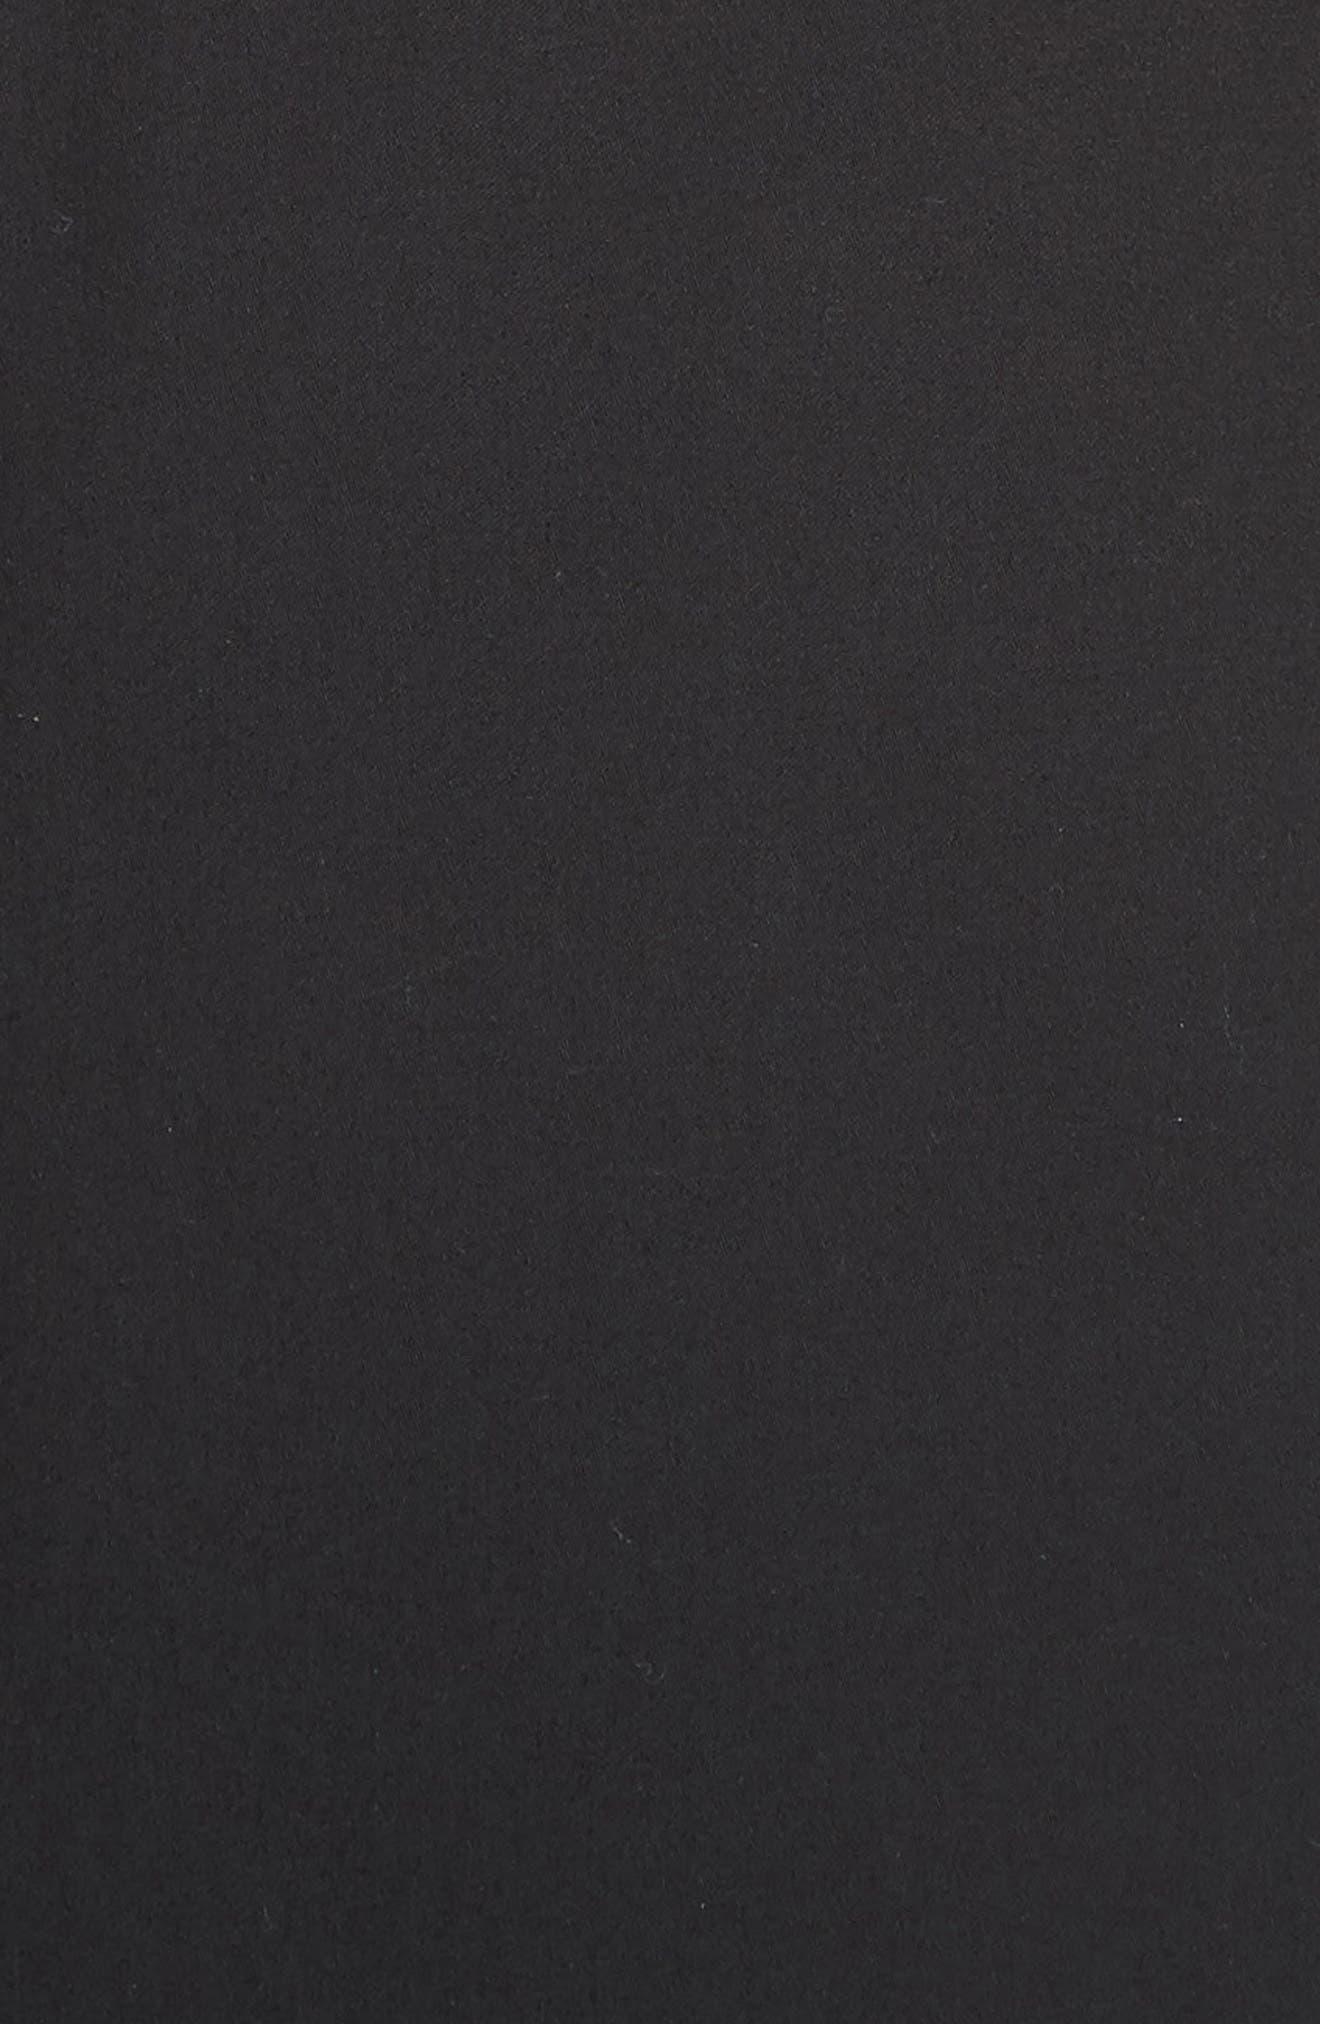 Patch Pocket Sateen Midi Dress,                             Alternate thumbnail 6, color,                             Black